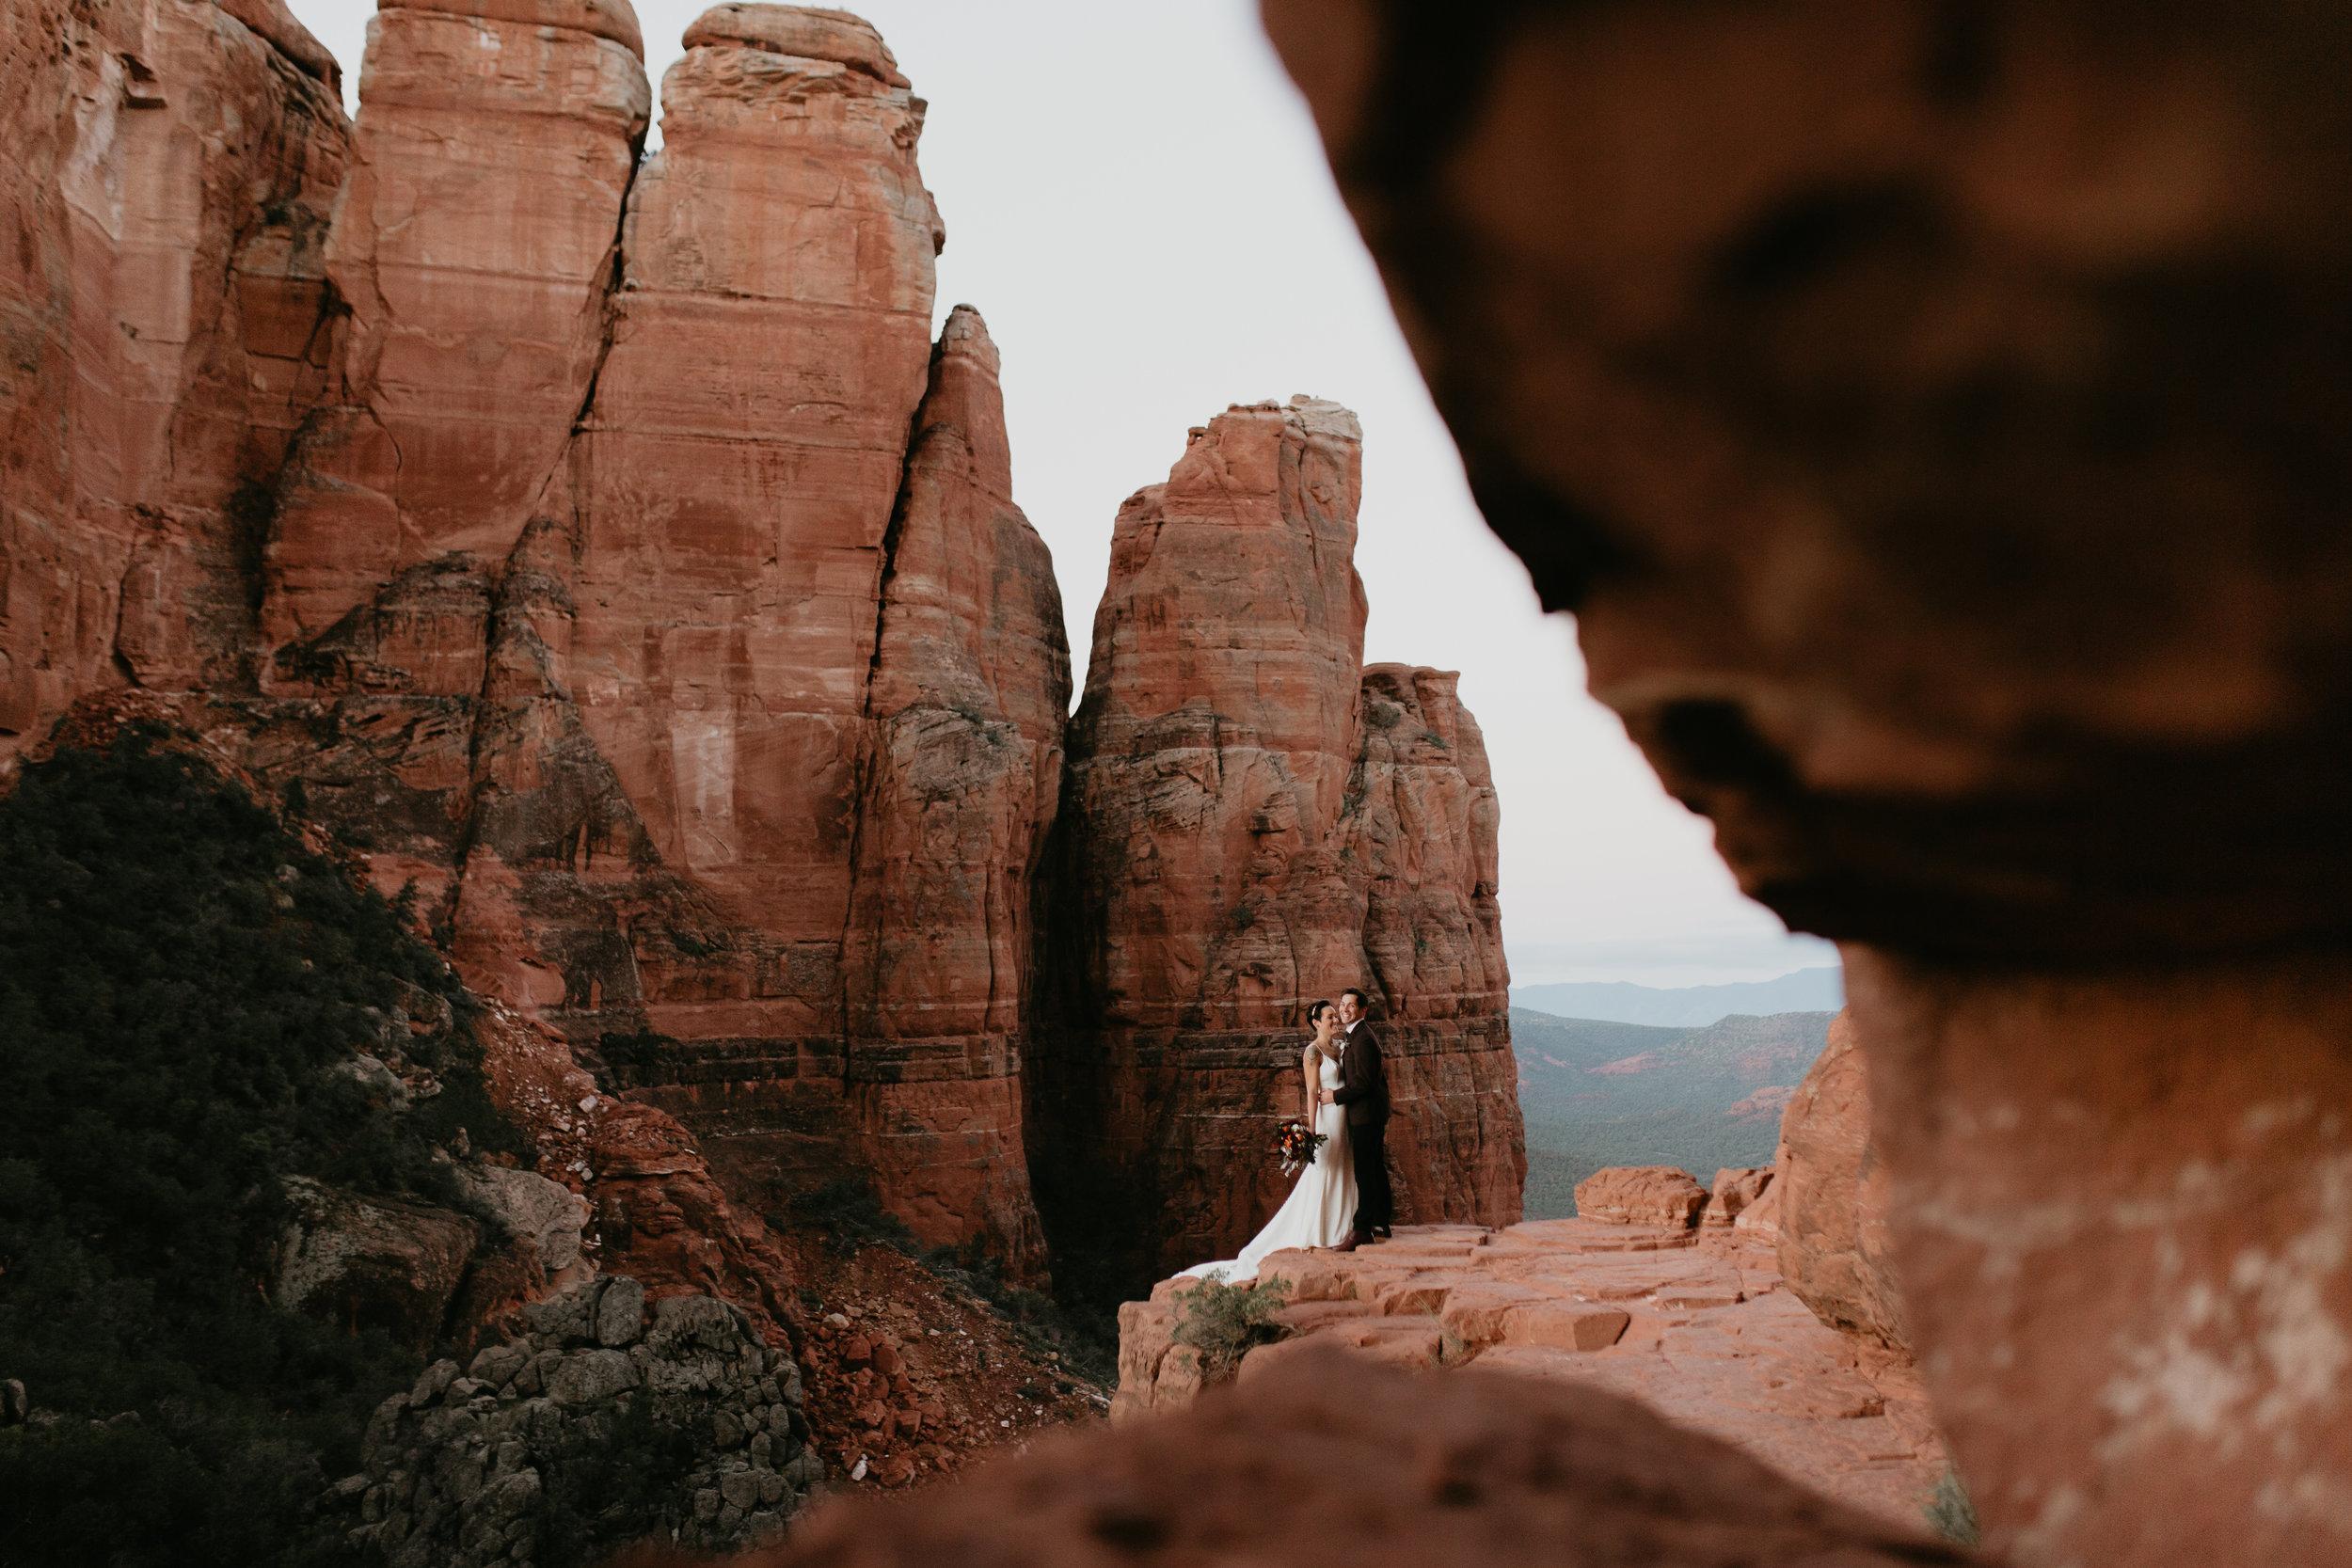 nicole-daacke-photography-sedona-arizona-destination-elopement-wedding-photographer-catherdral-rock-hiking-elopement-sedona-river-elopement-photos-desert-rock-wedding-photographer-laid-back-spontaneous-elopement-16.jpg